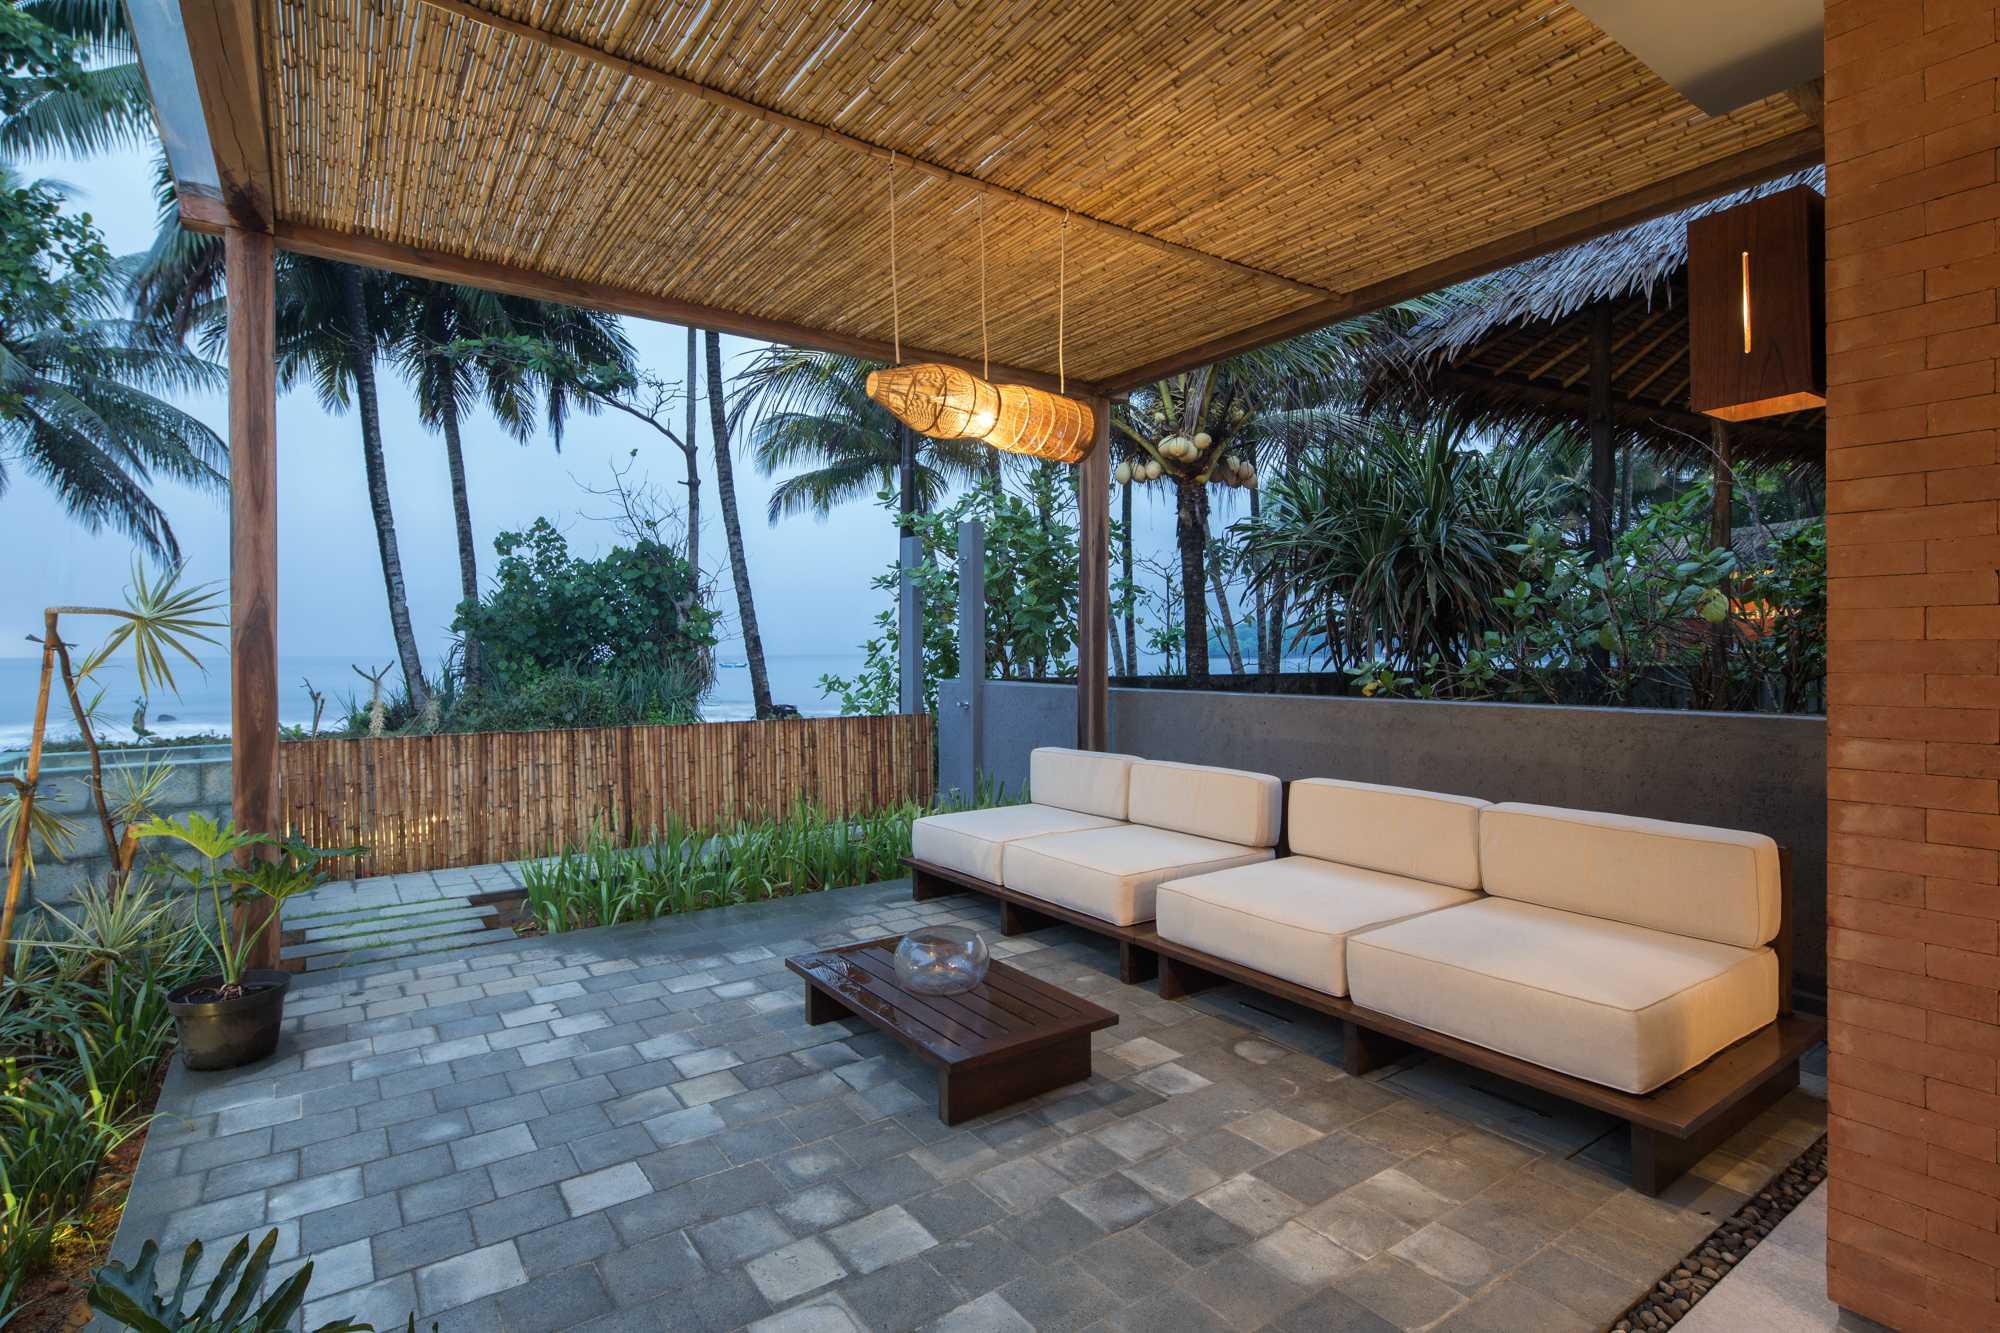 Erwin Kusuma Batu Karas Villa Batukaras Beach, West Java, Indonesia Batukaras Beach, West Java, Indonesia Erwin-Kusuma-Batu-Karas-Villa   64724